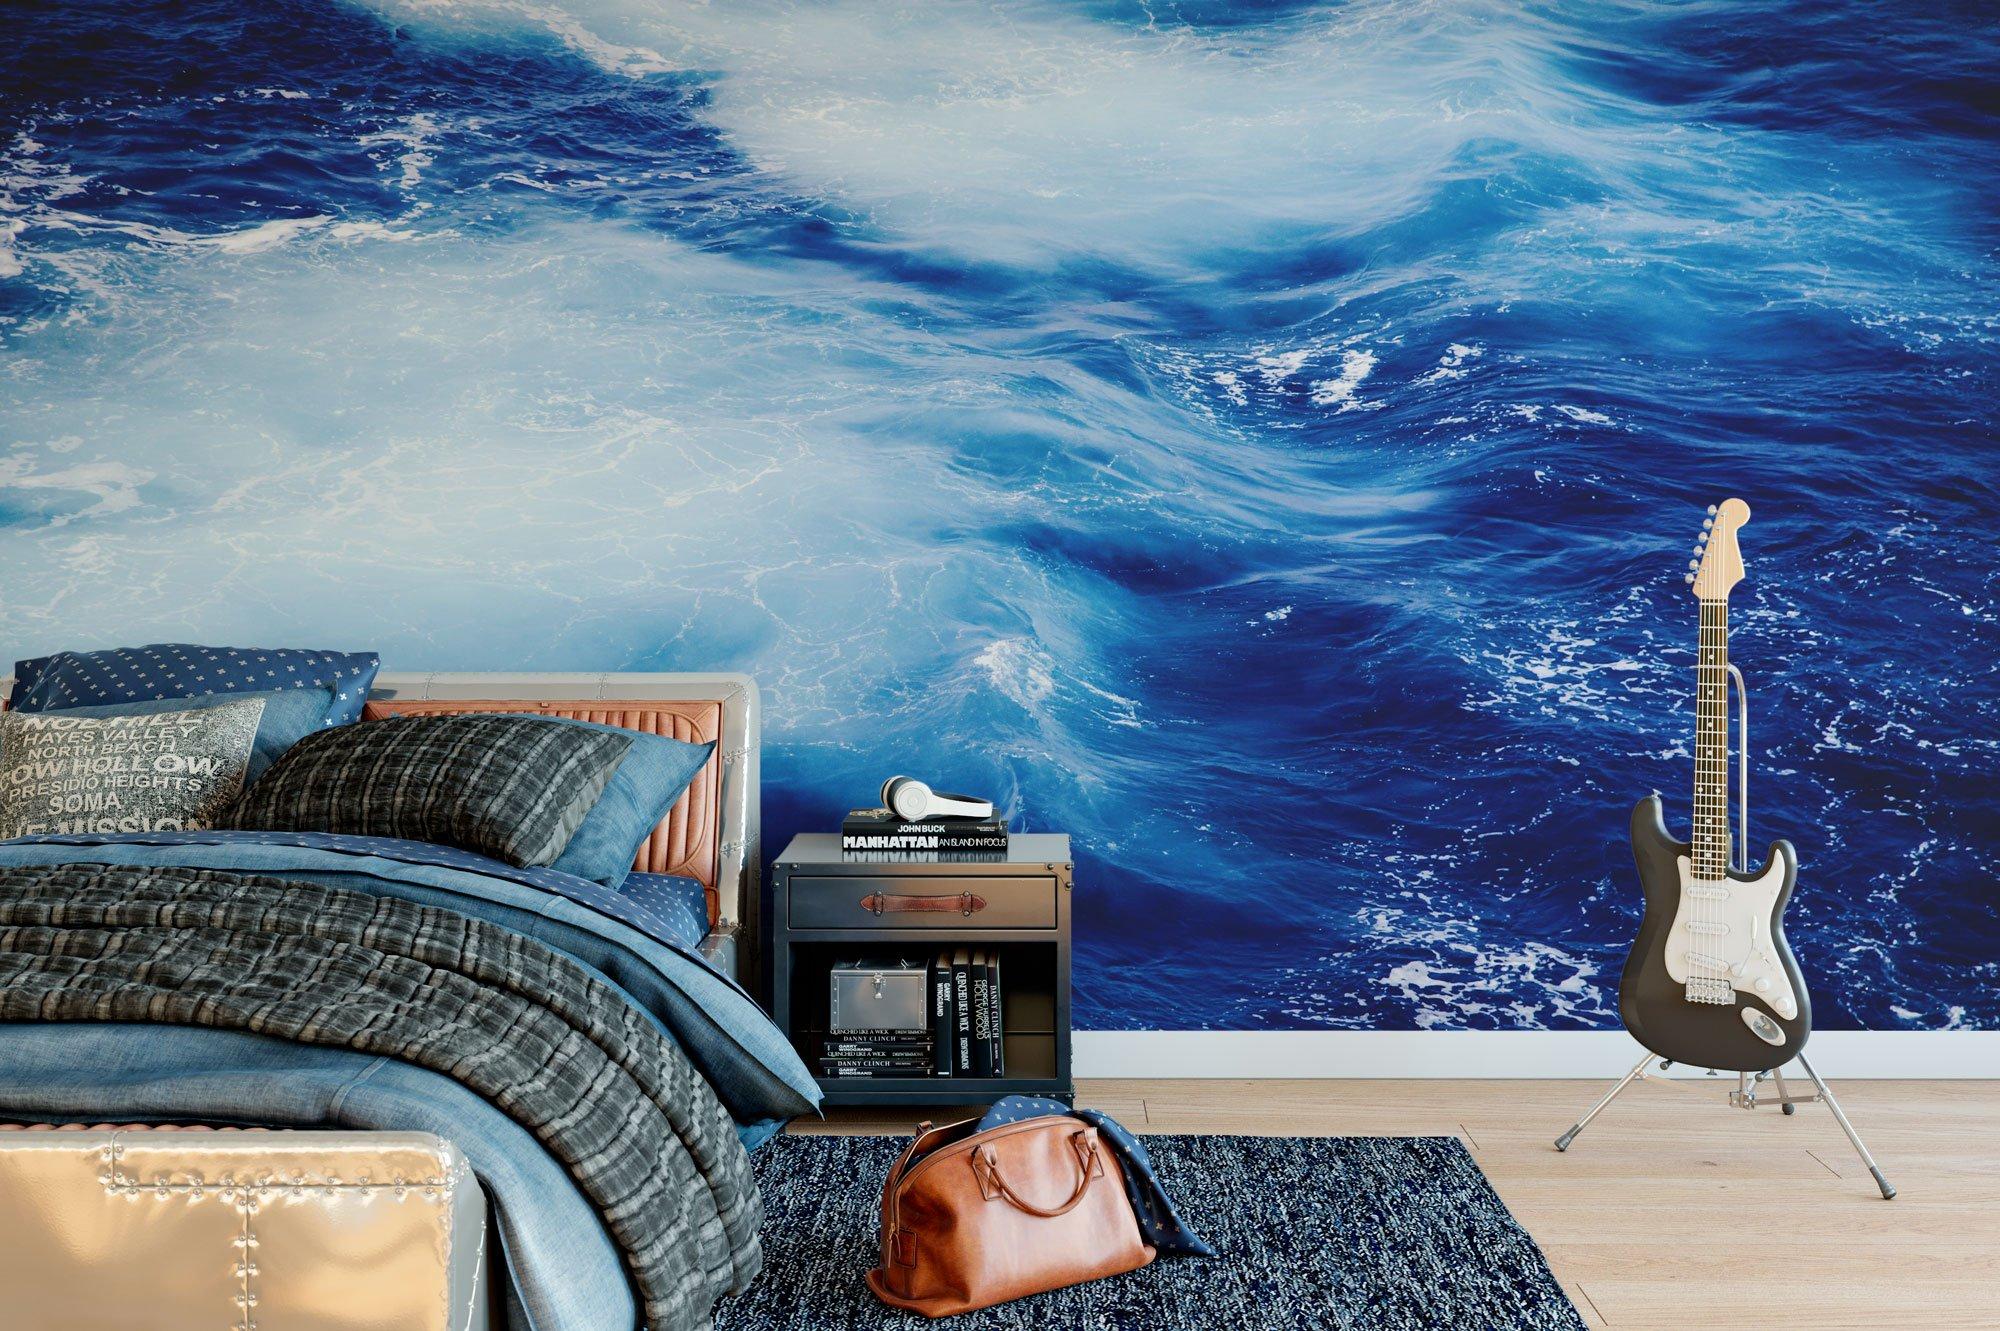 360 Waves Wallpaper: Ocean Breeze Ocean Mural Wallpaper Photo Landscape Waves